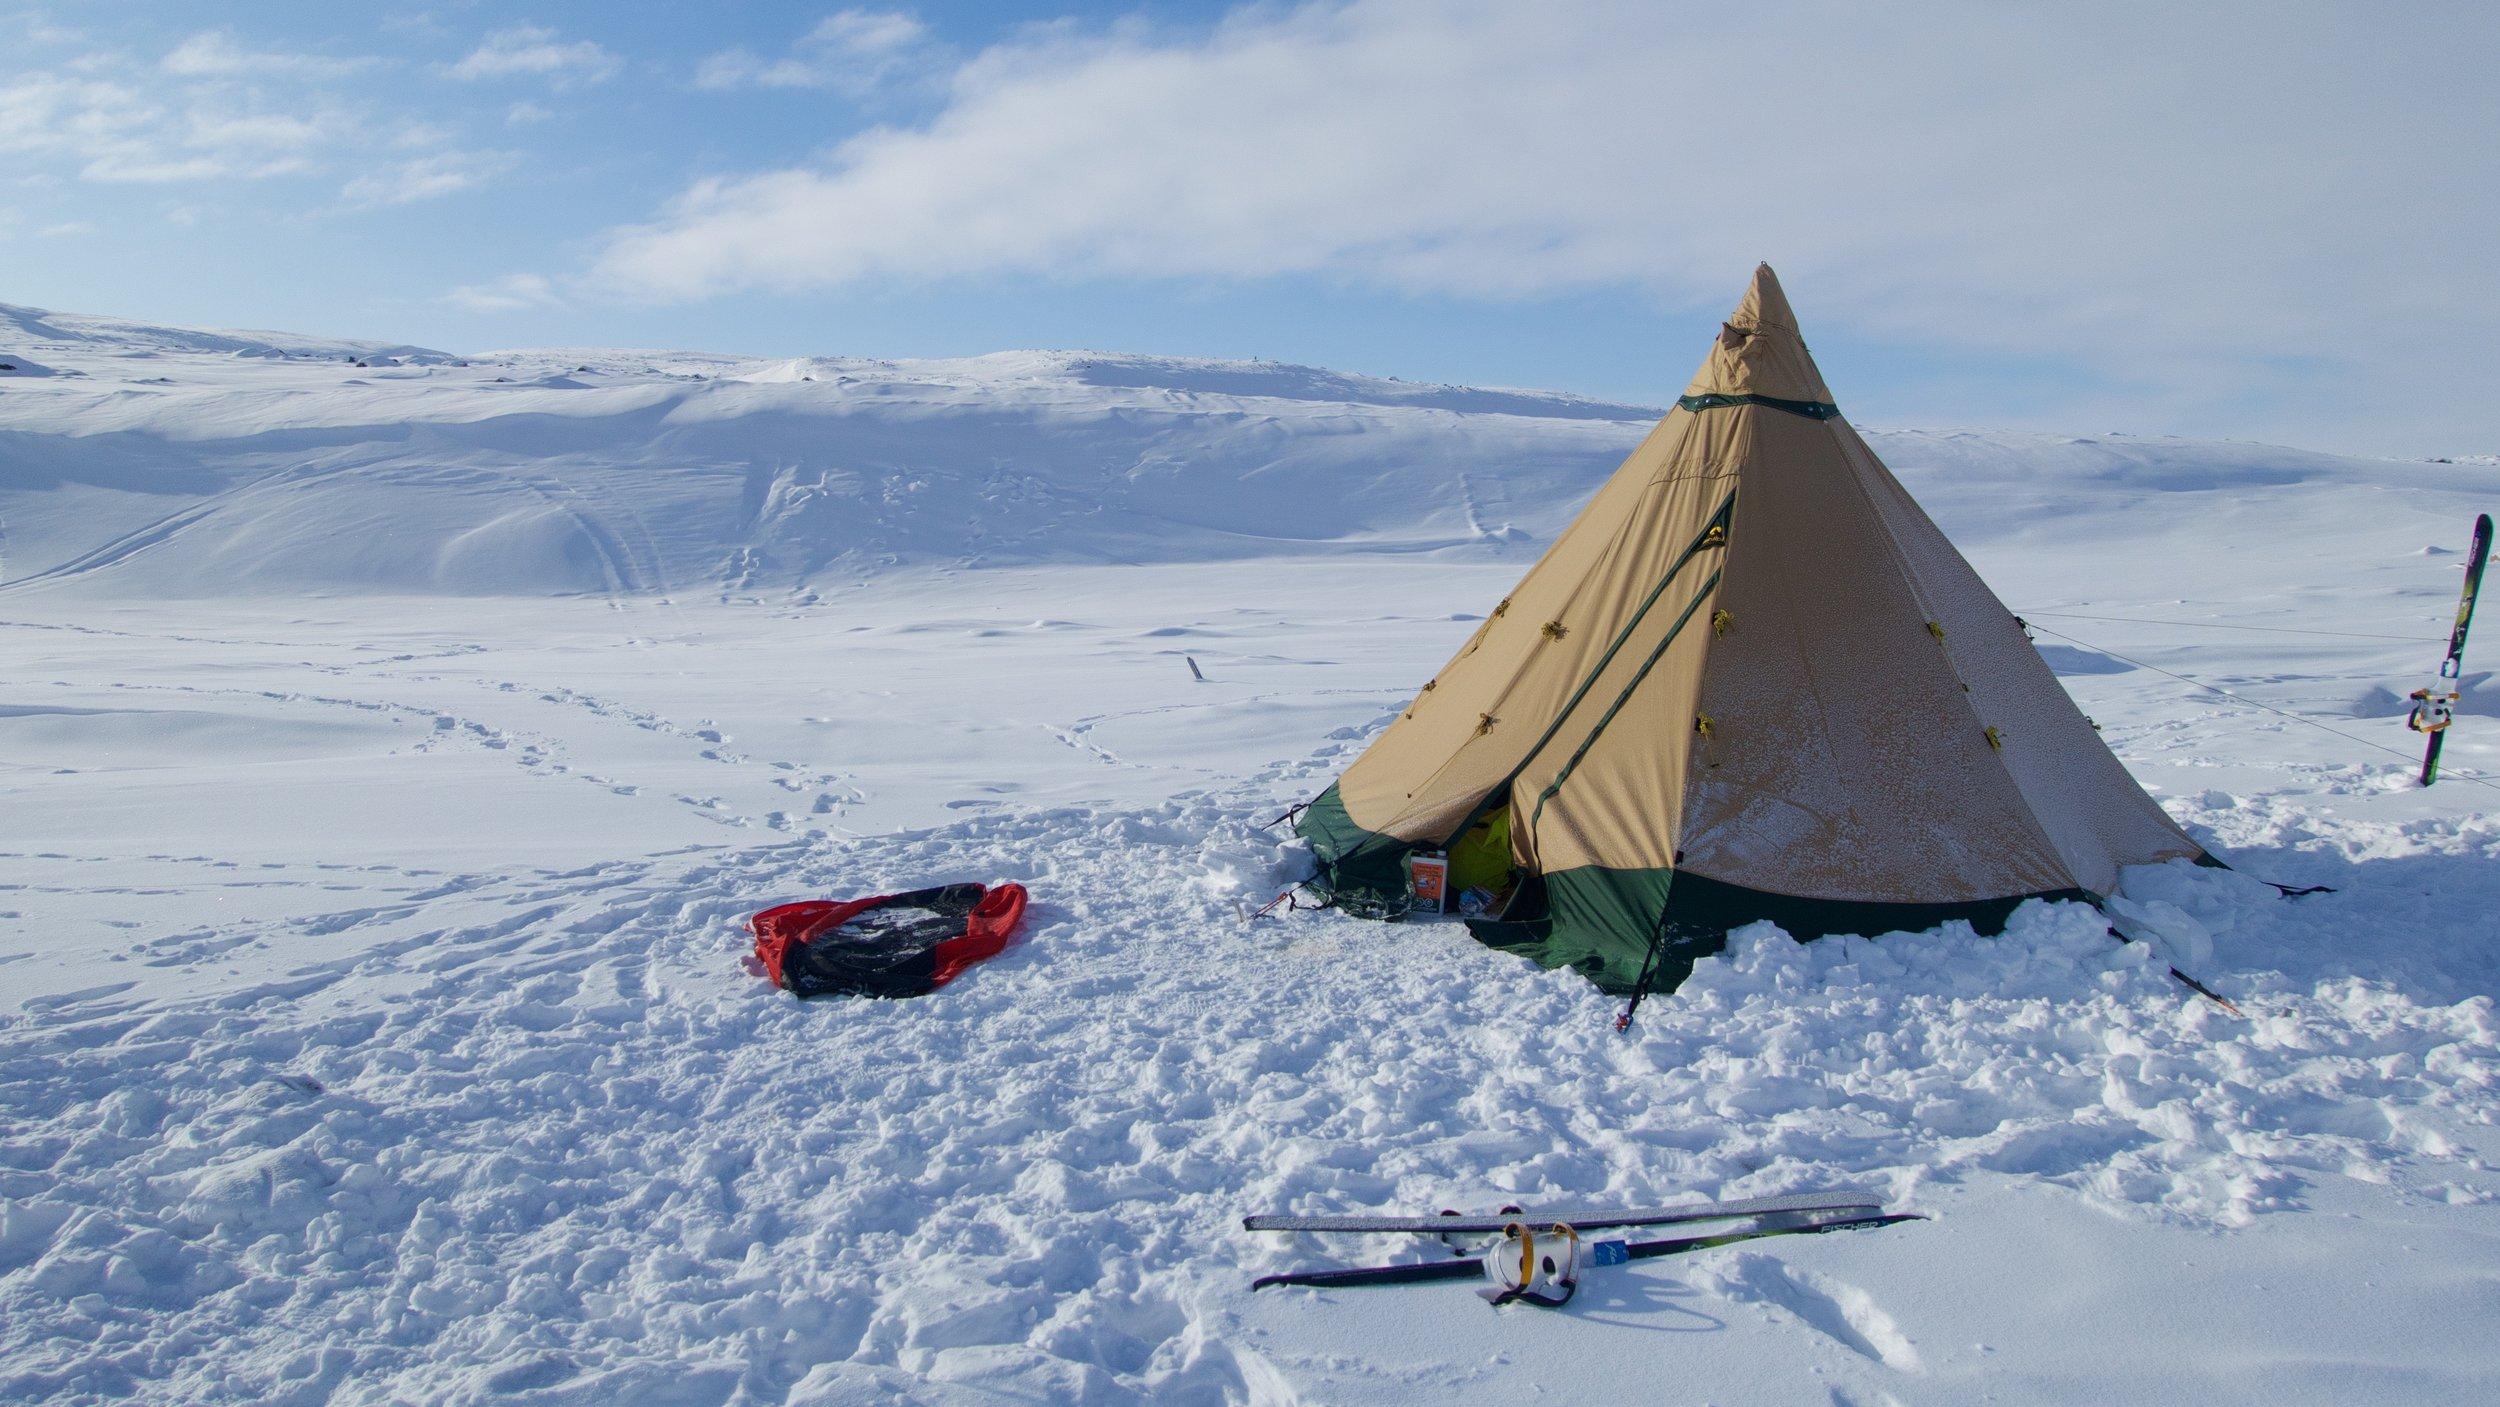 Last camp Spot